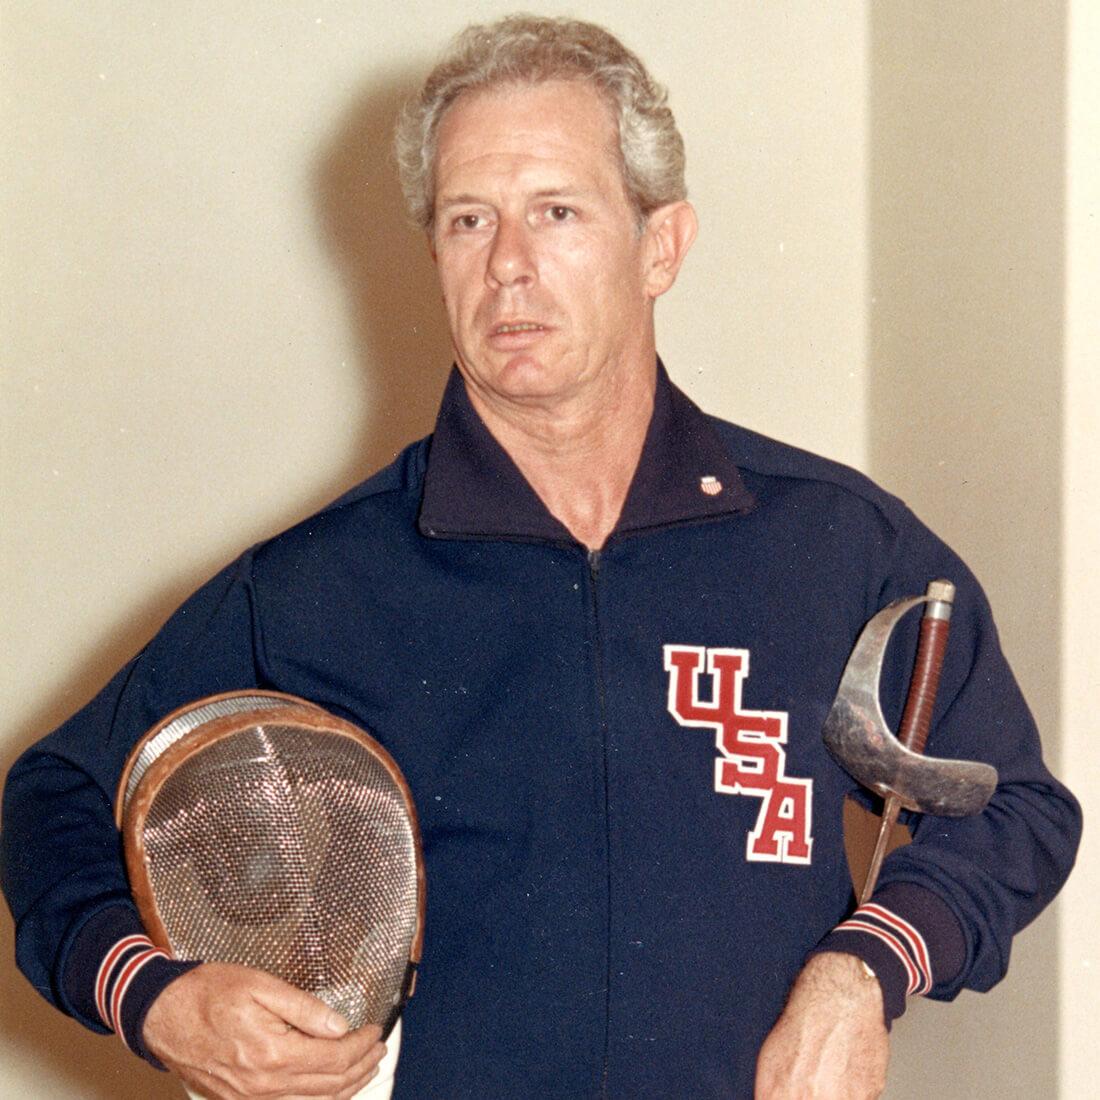 fencer-delmar-calvert from west coast fencing archive